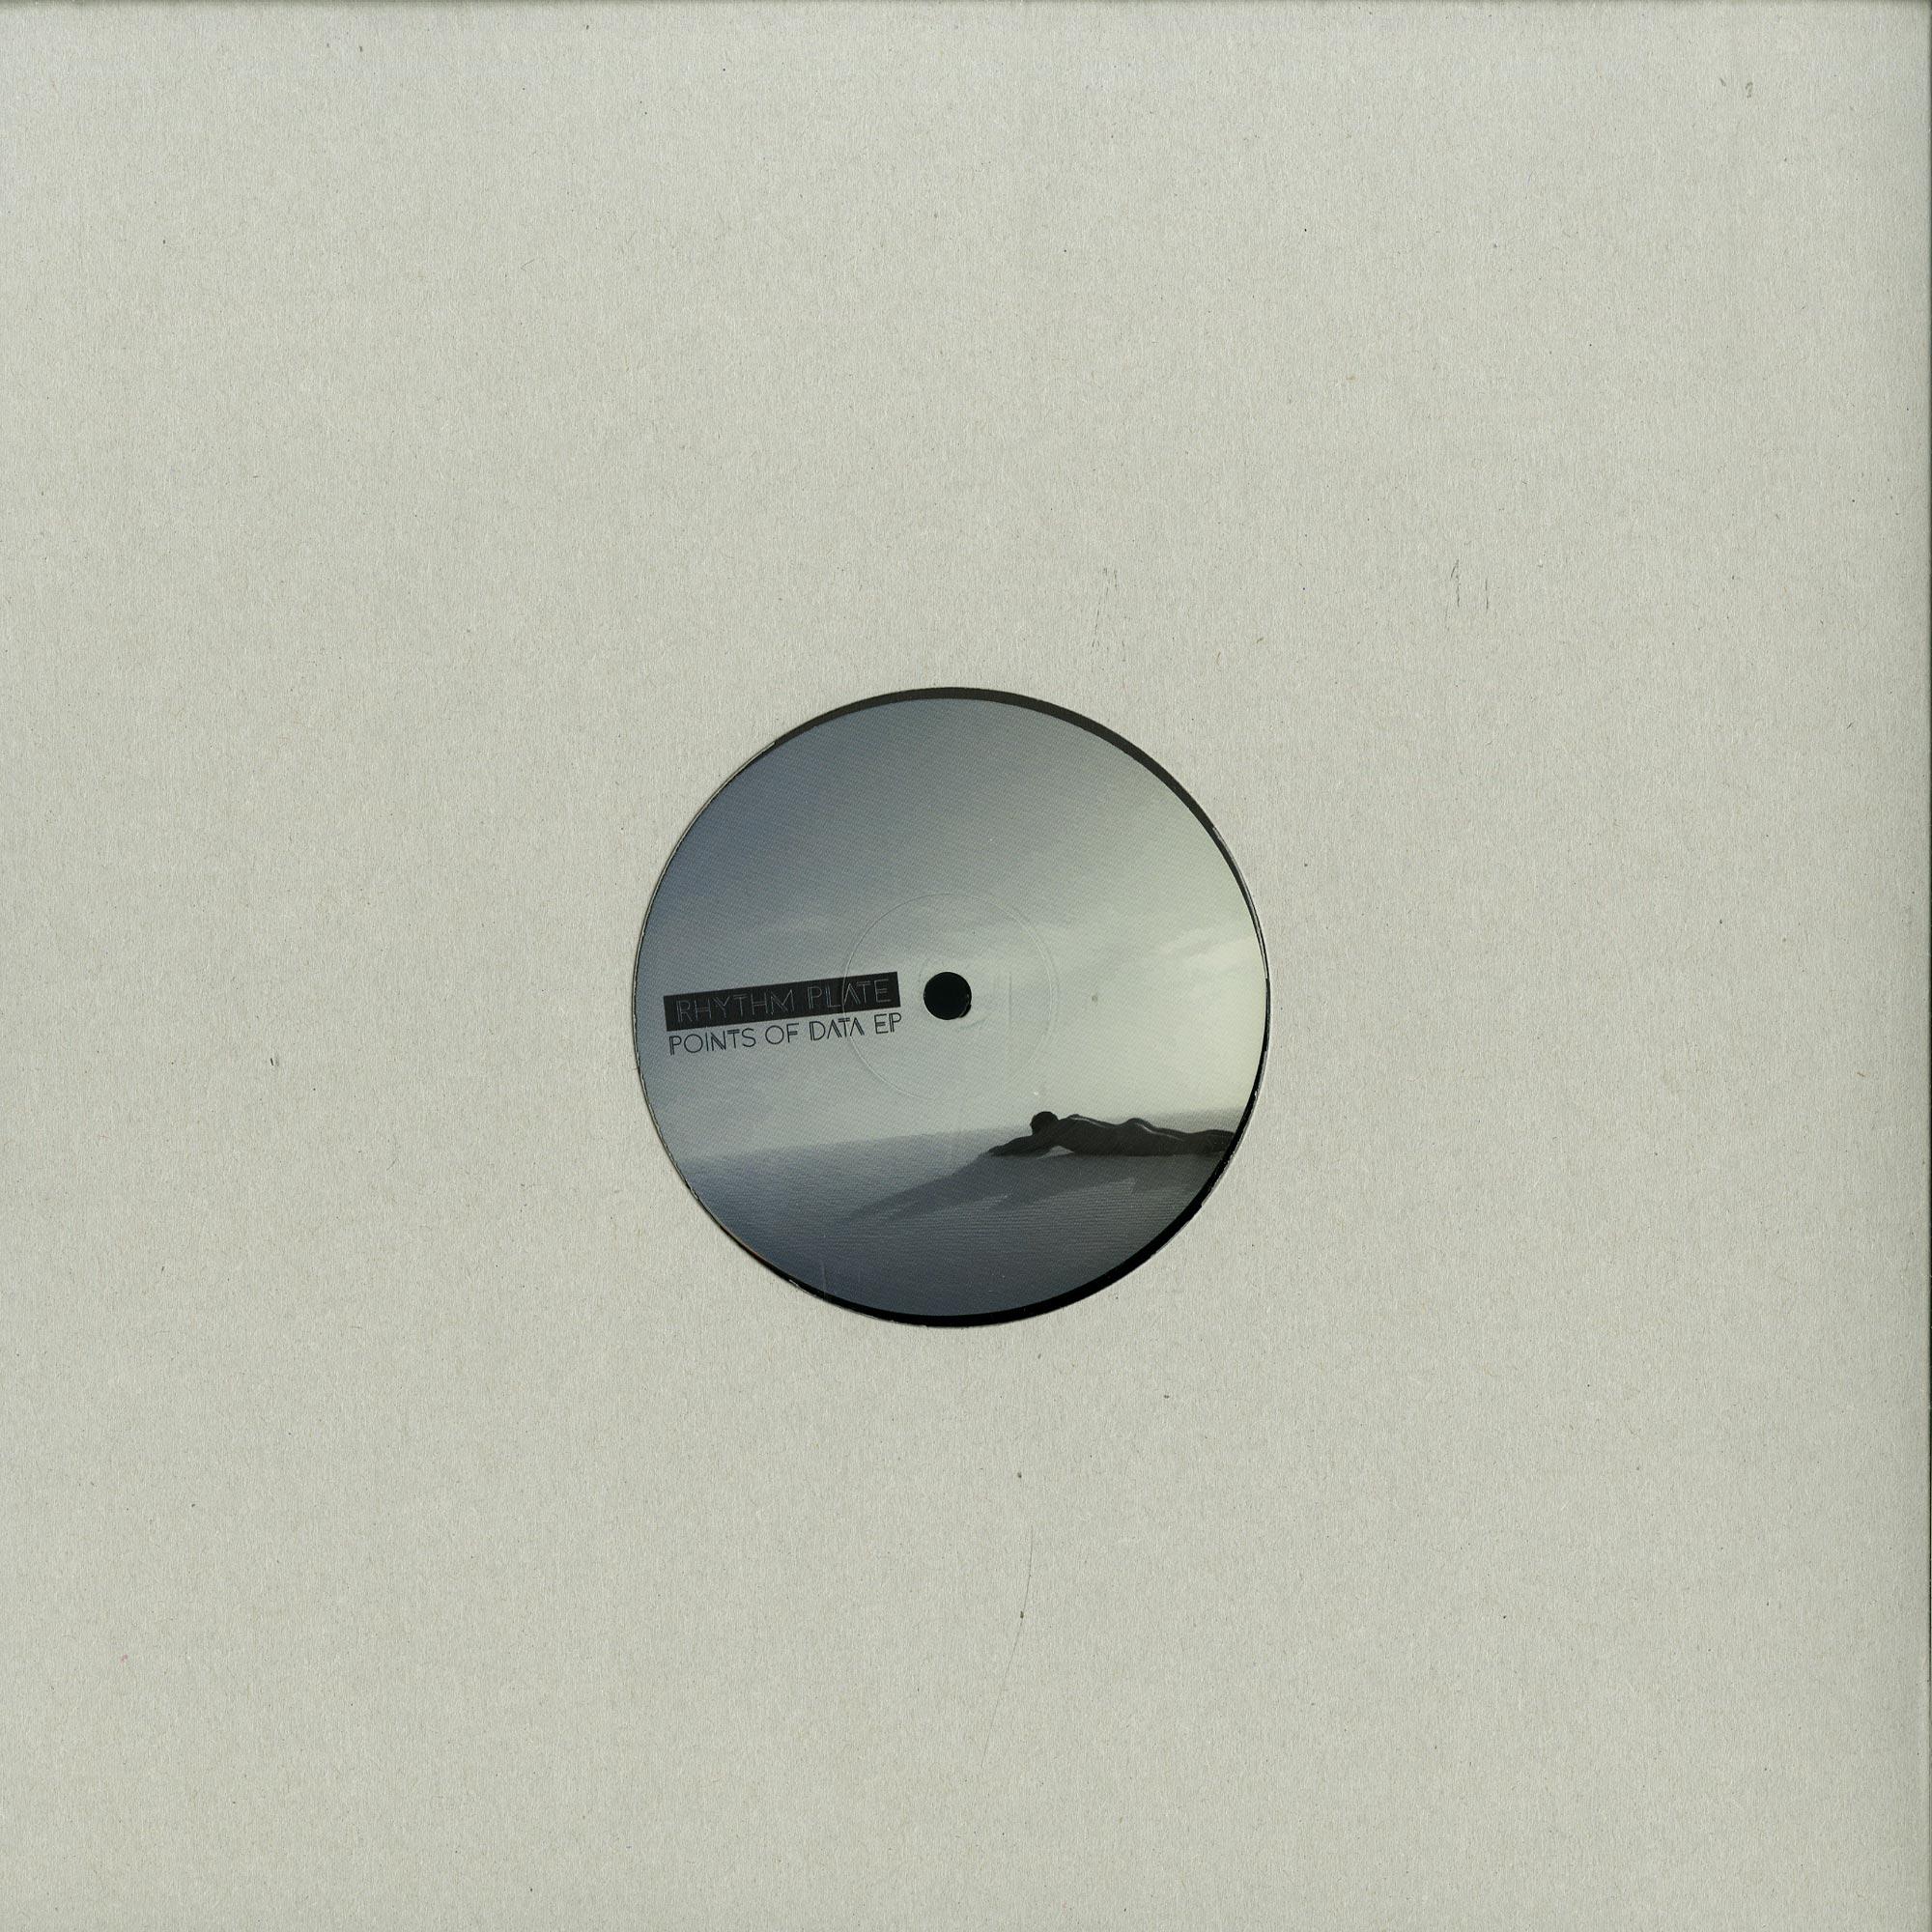 Rhythm Plate - POINT OF DATA EP